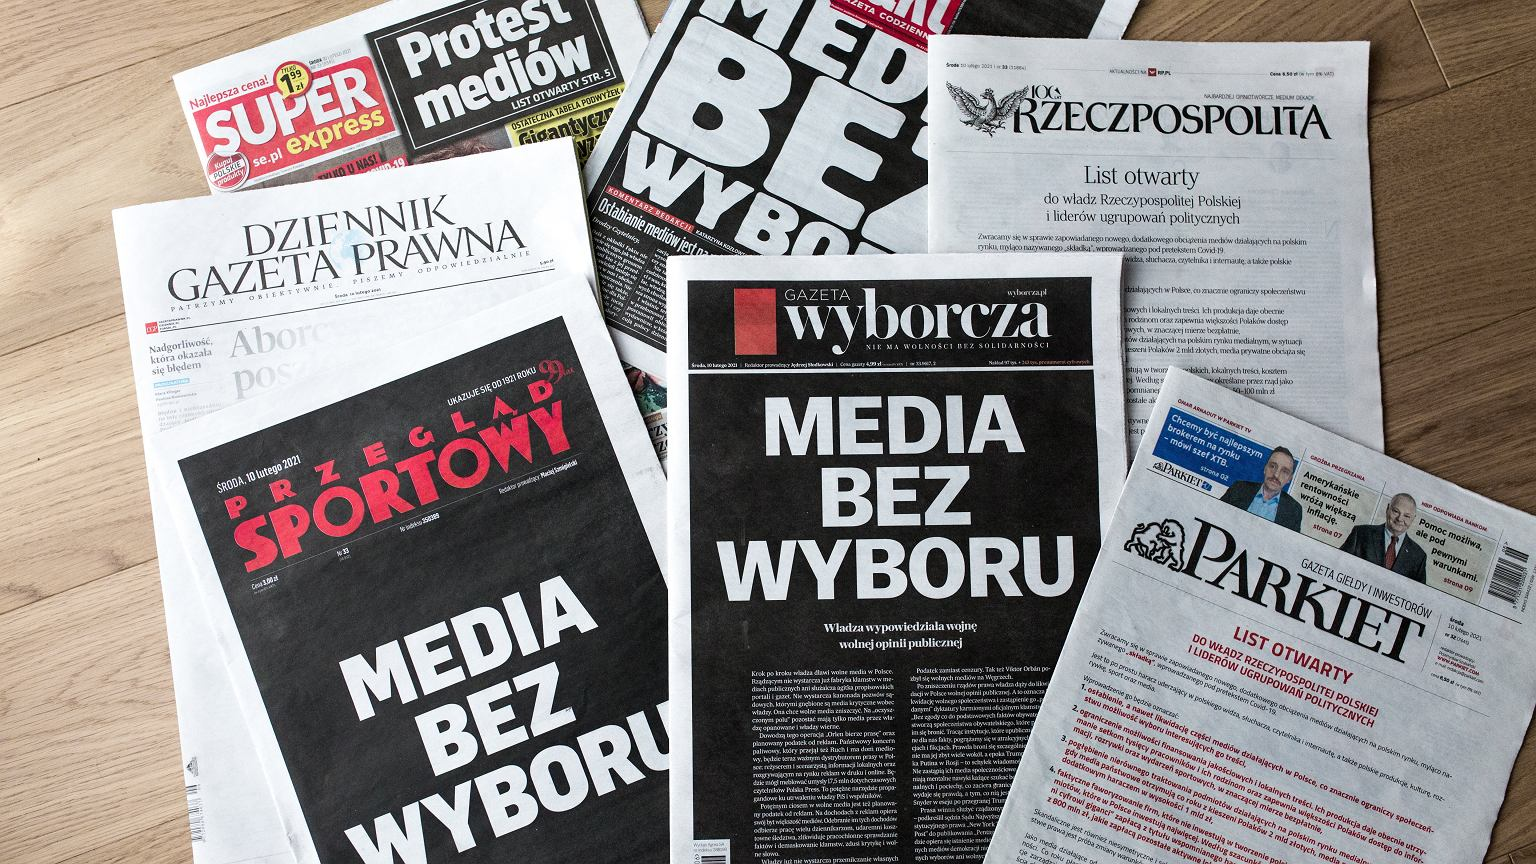 Jakub Kwieciński and Dawid Mycek conducted a survey in Chocianów regarding advisors' idea for 'LGBT Free Zone'